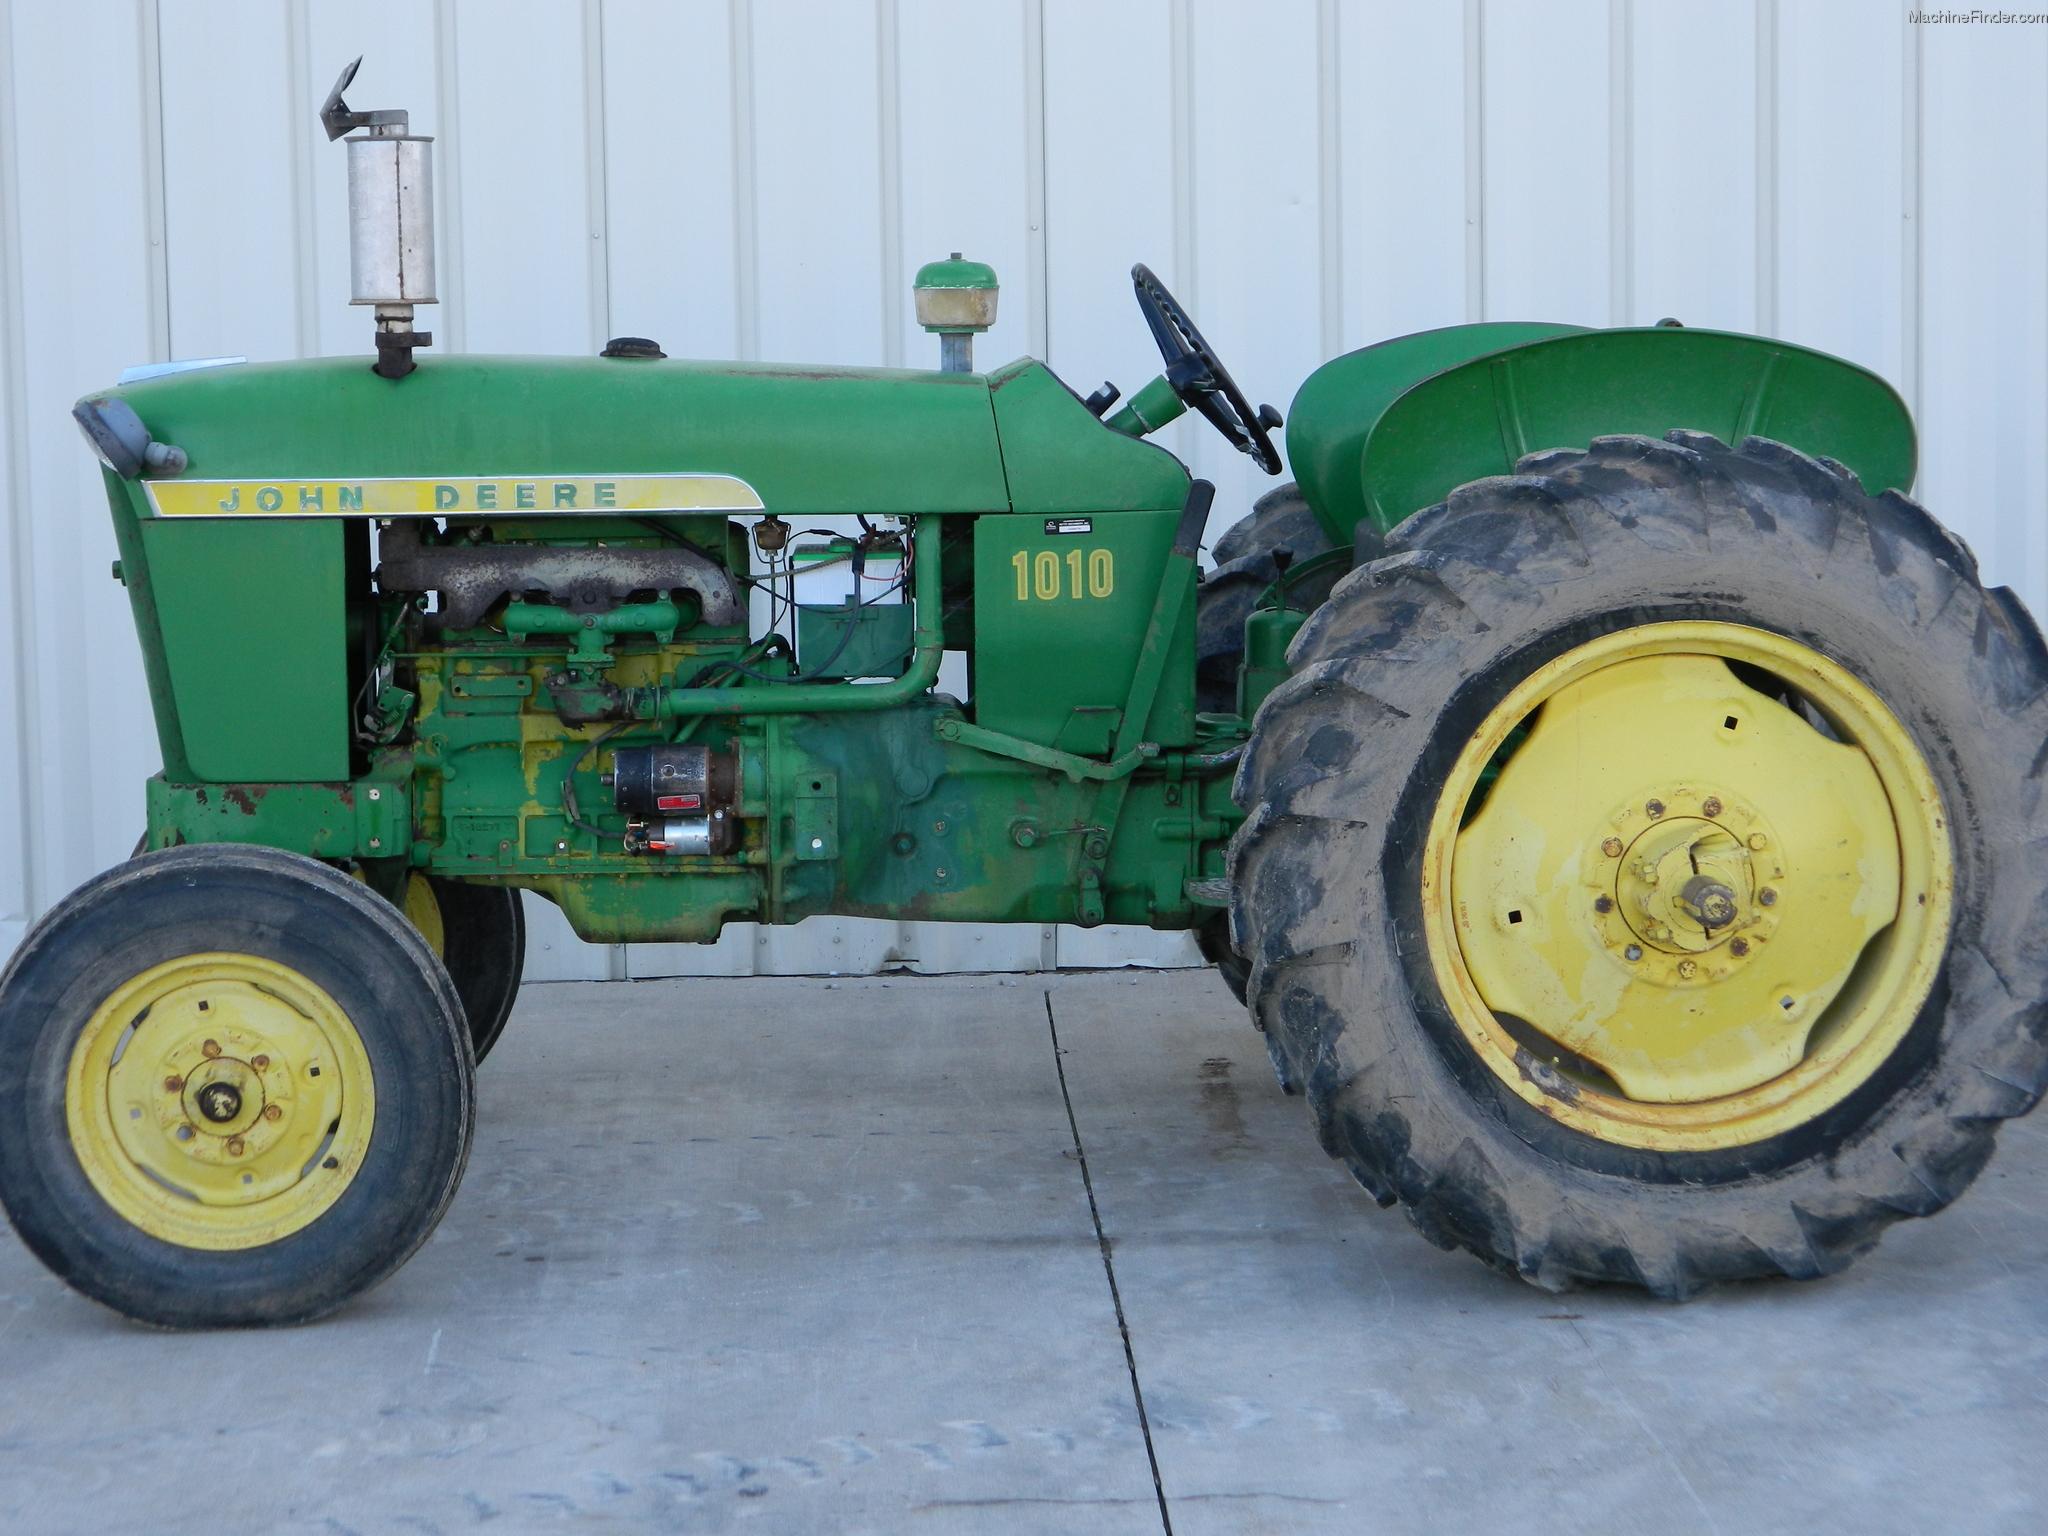 1963 John Deere 1010 Tractors - Utility (40-100hp) - John ...